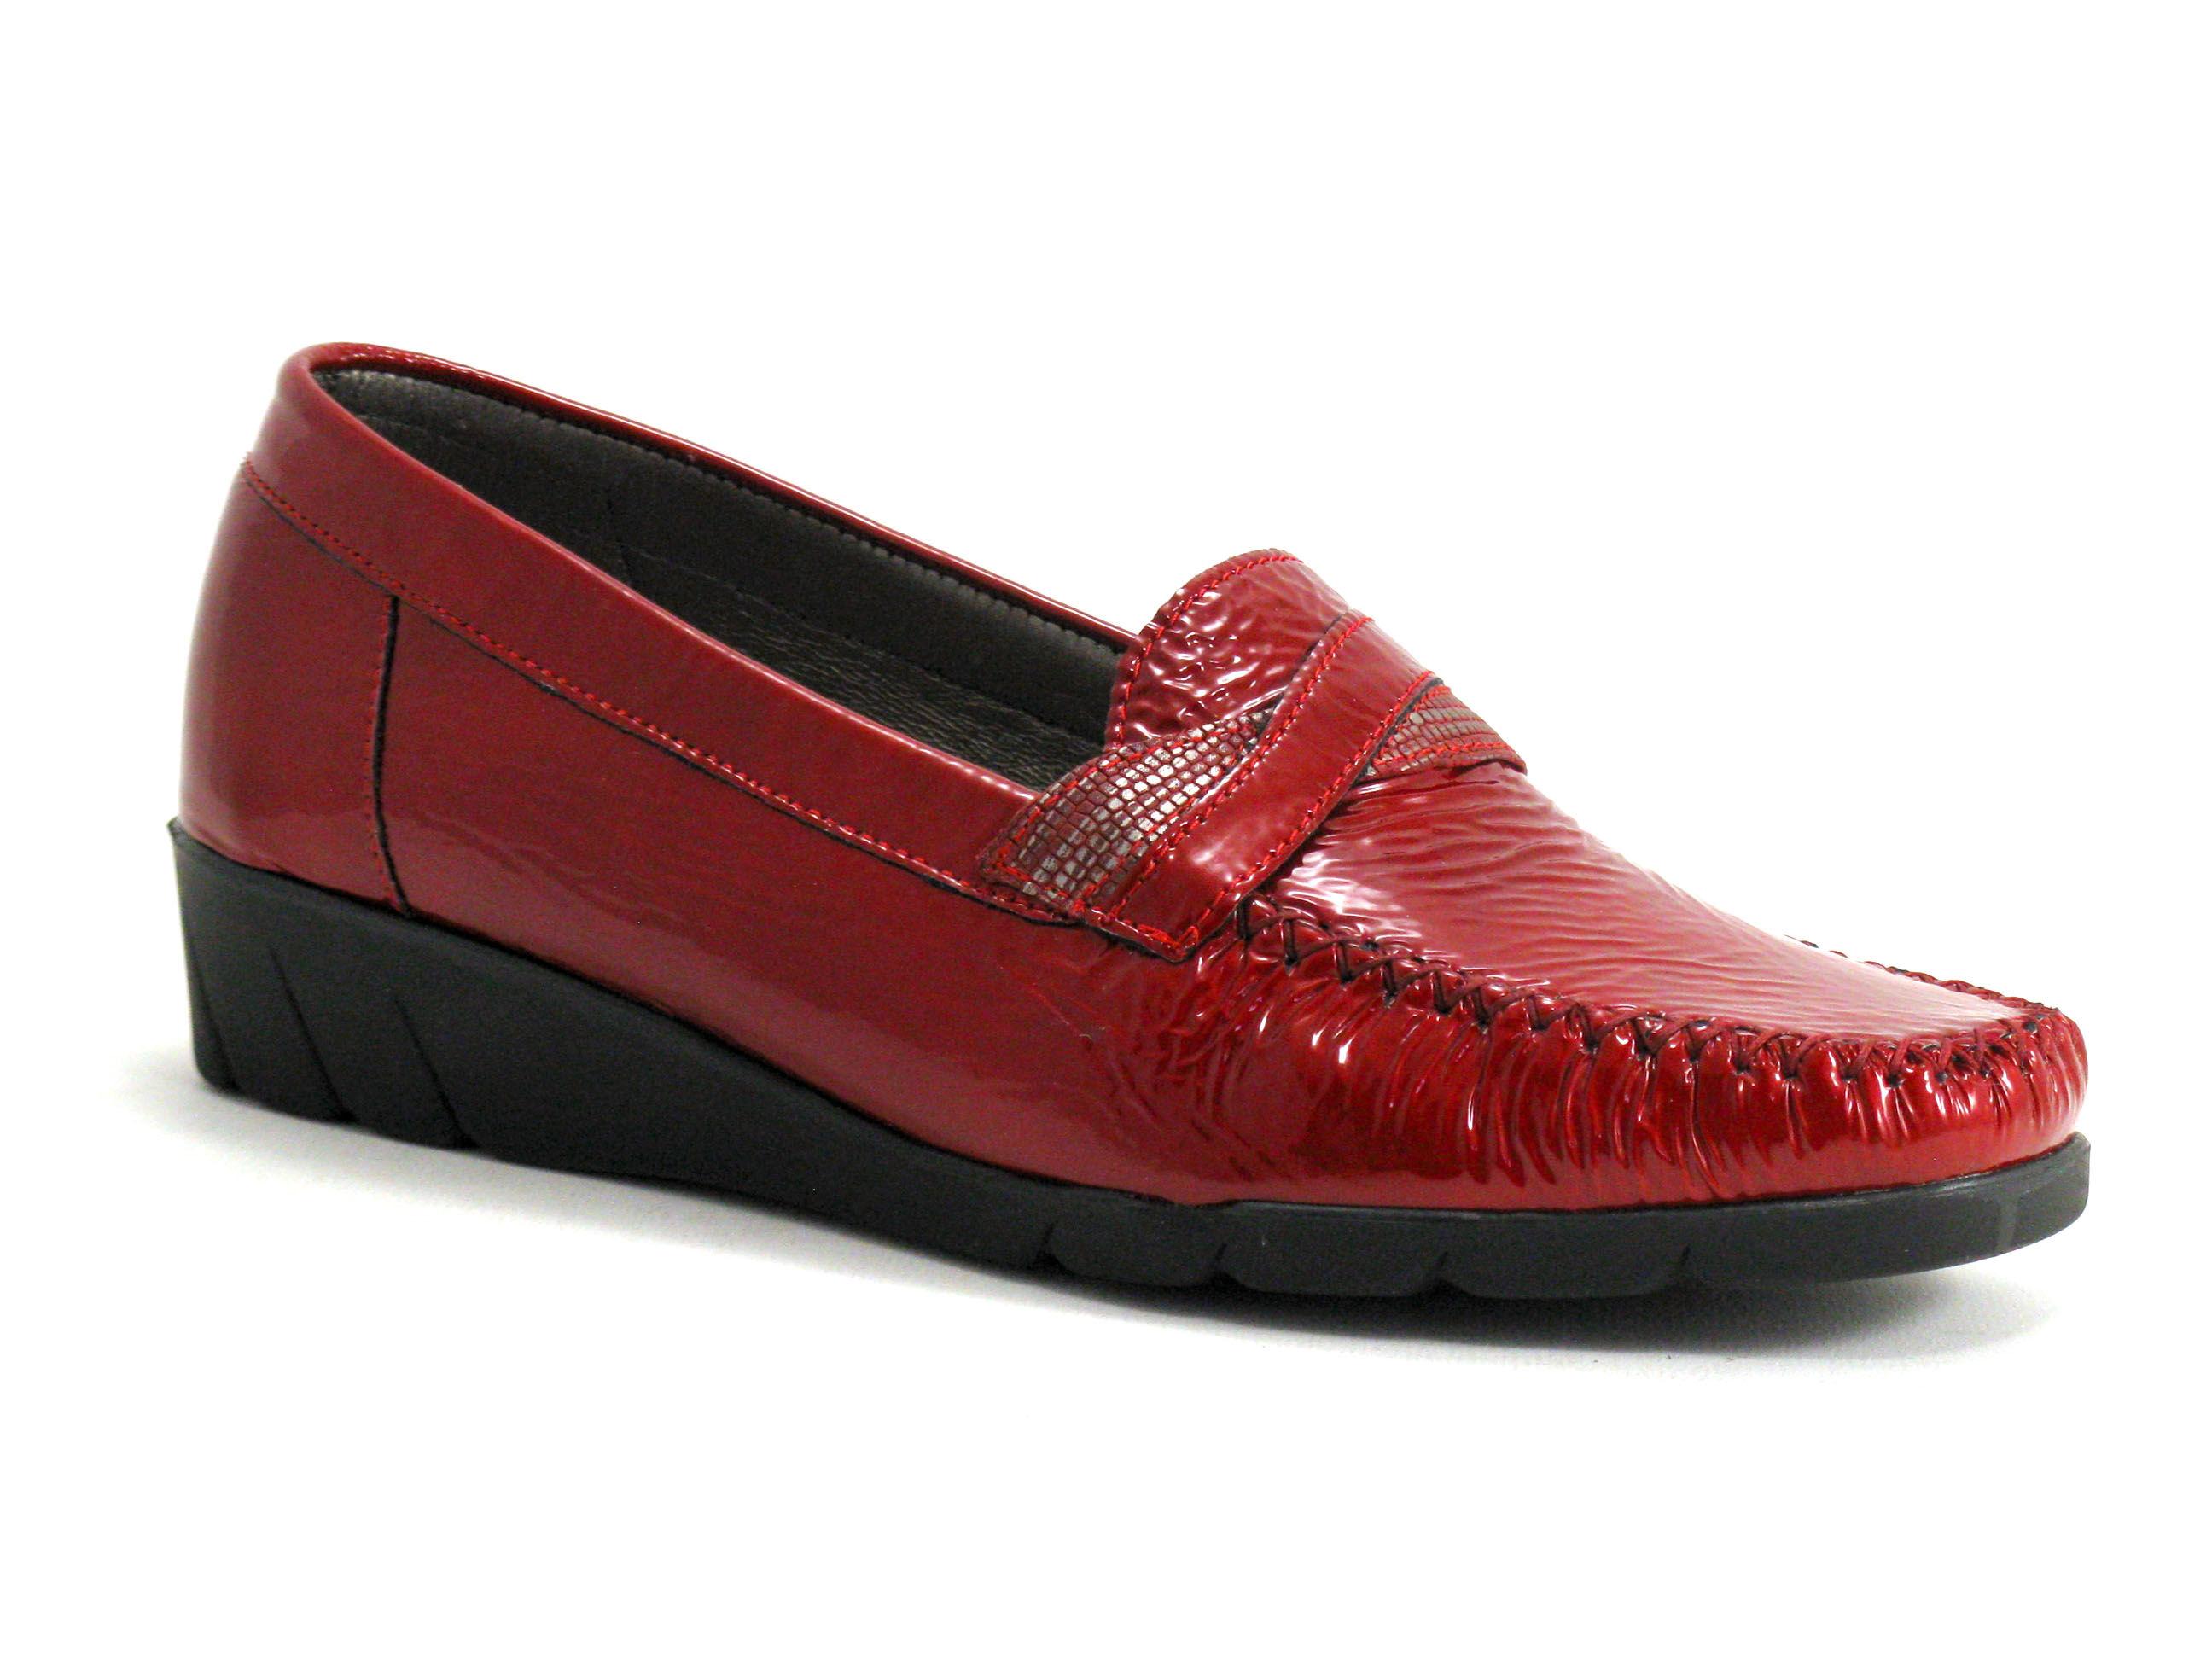 Pedi Girl Chaussure basse / Derby Femme Pedi Girl - Bordeaux,Rouge - Point. 36,37,38,39,40,41